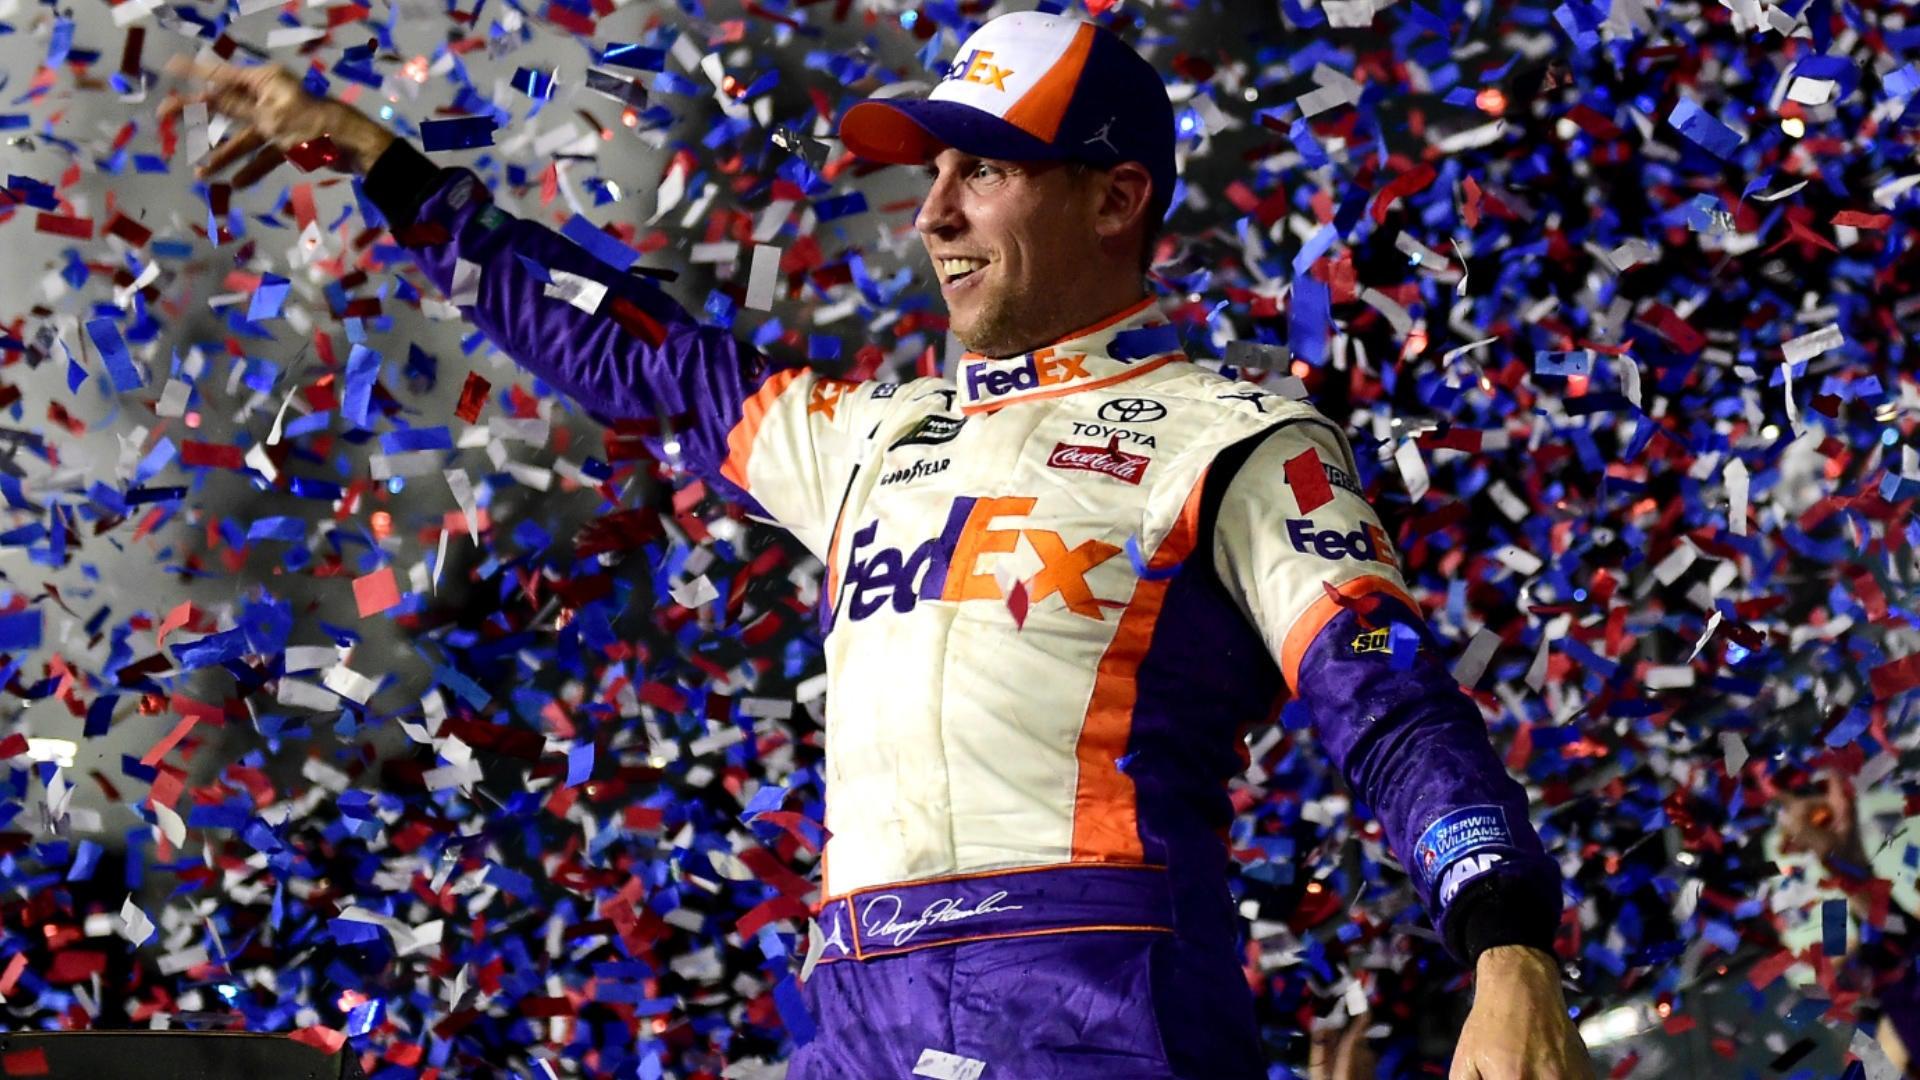 2019 Daytona 500 results: Denny Hamlin holds off Kyle Busch, avoids crashes to win NASCAR's biggest race